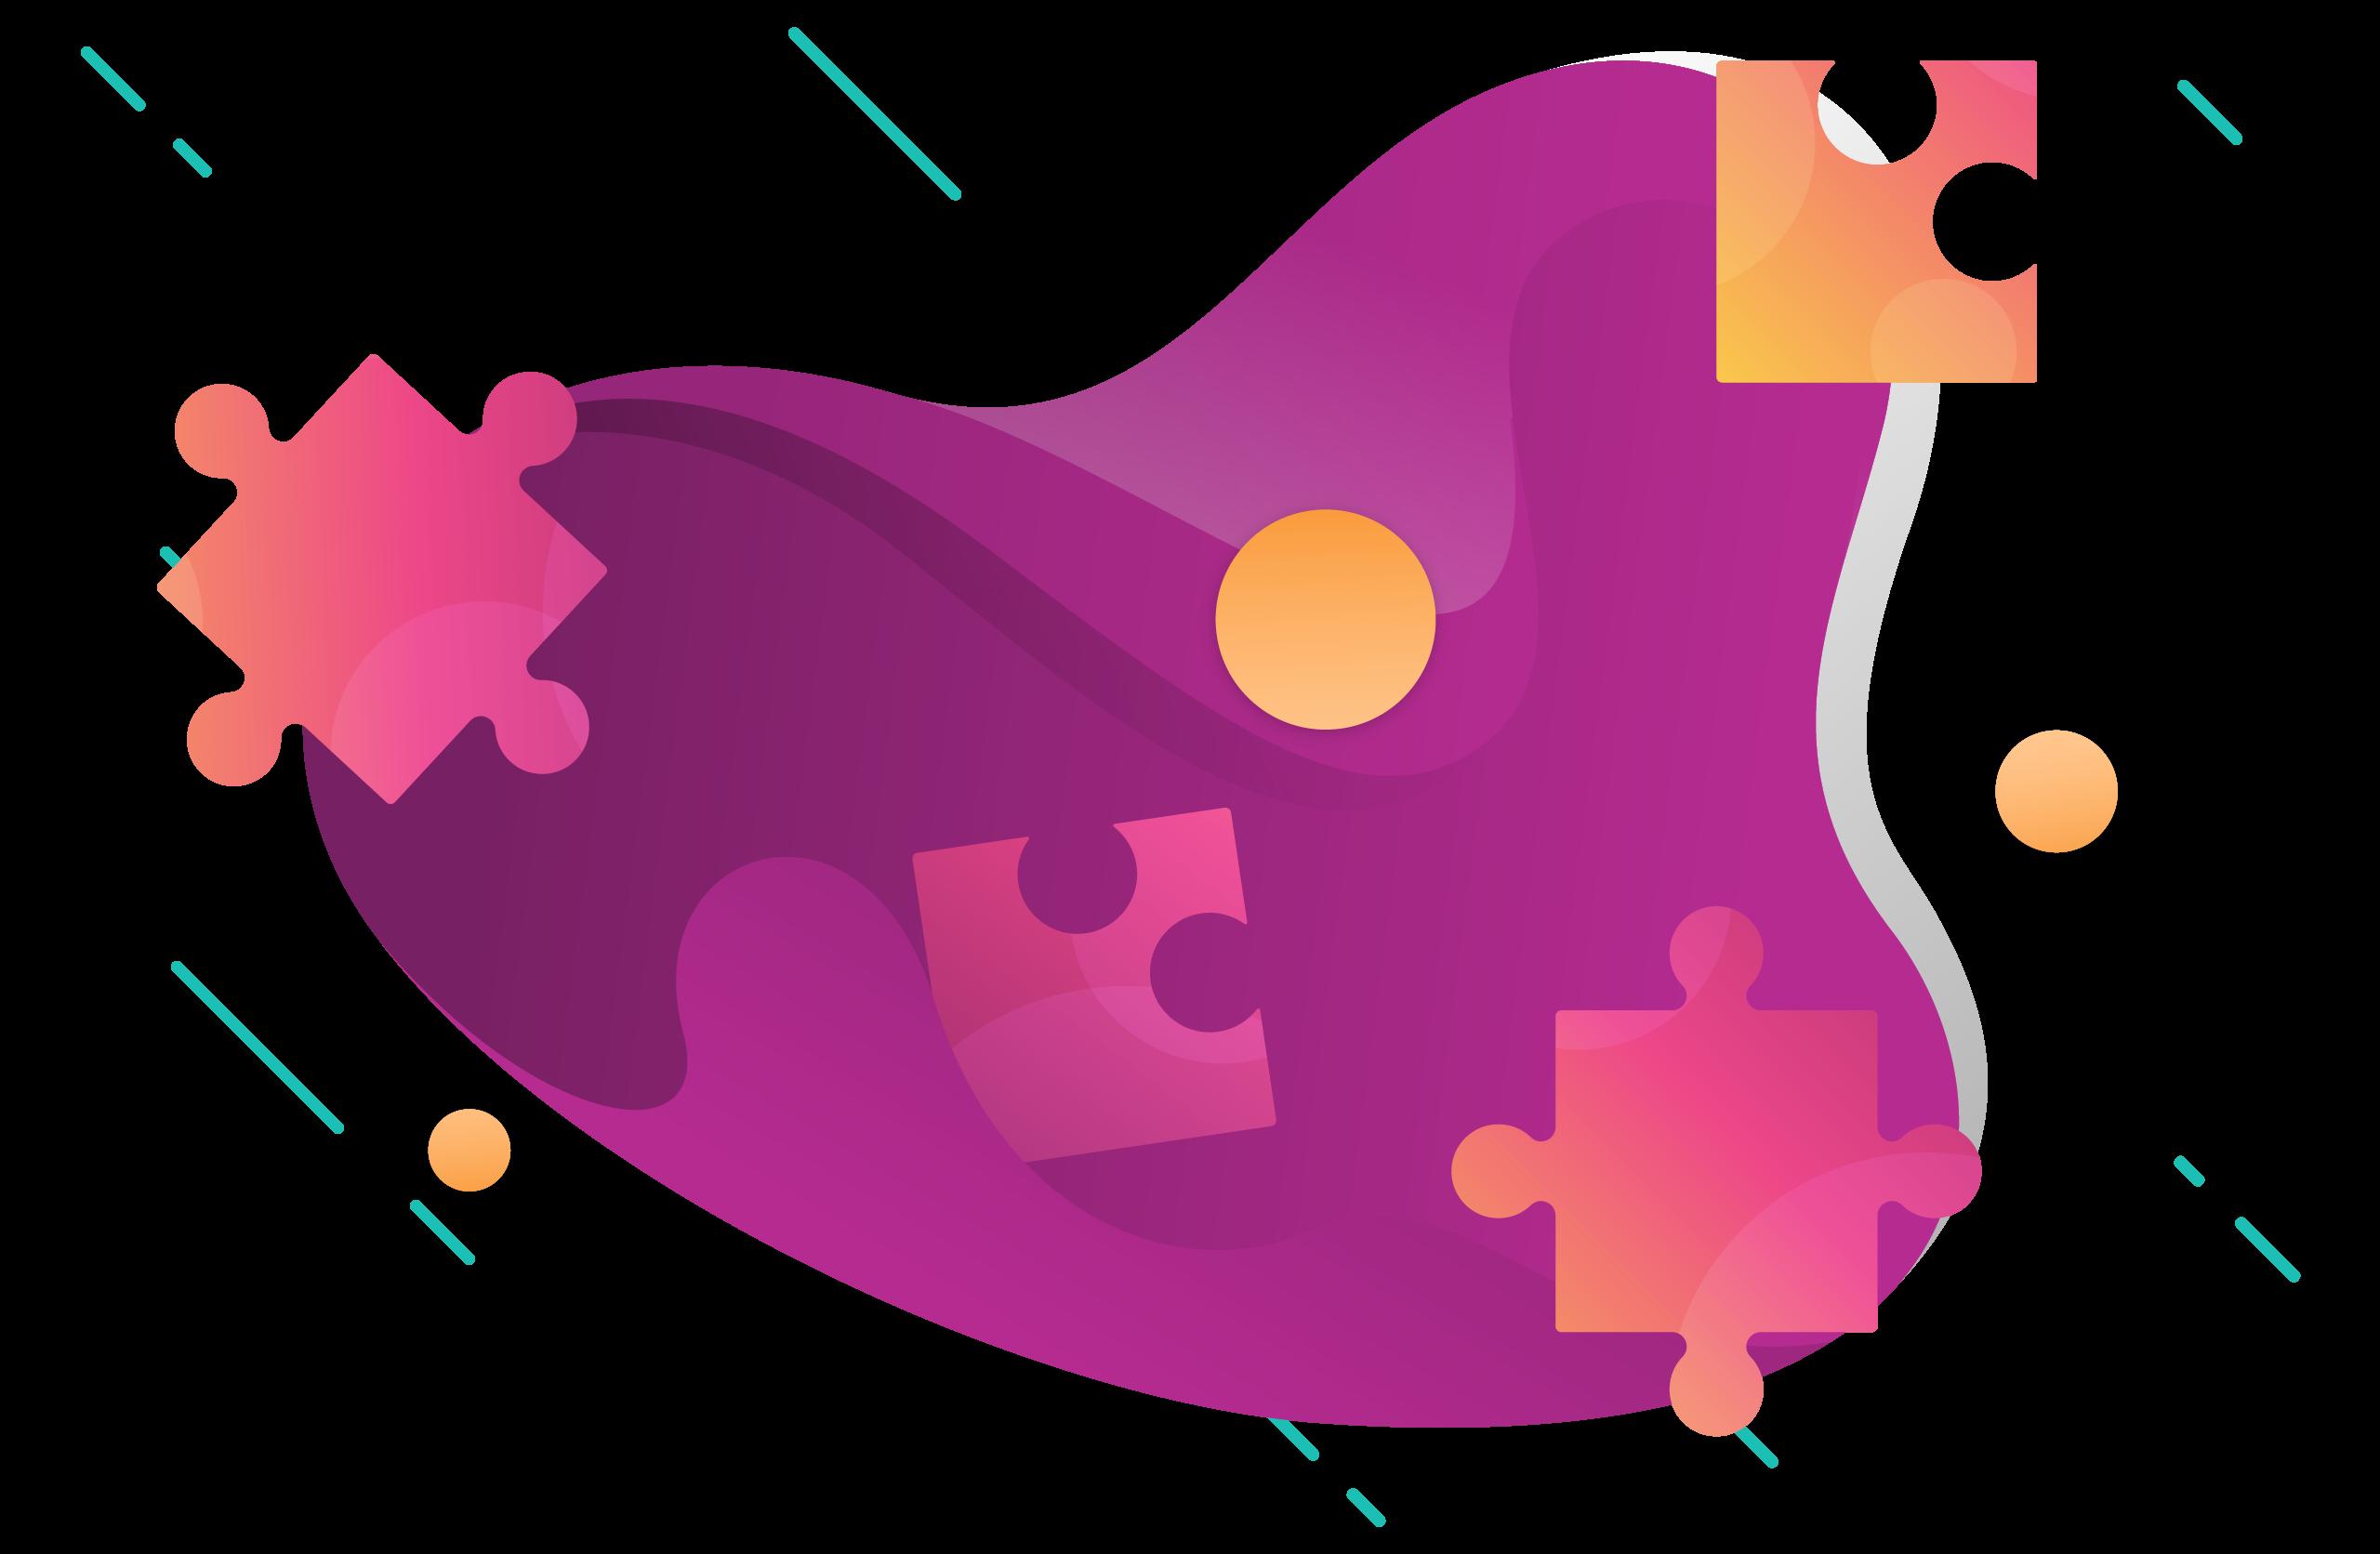 Purple puzzle pieces on black background